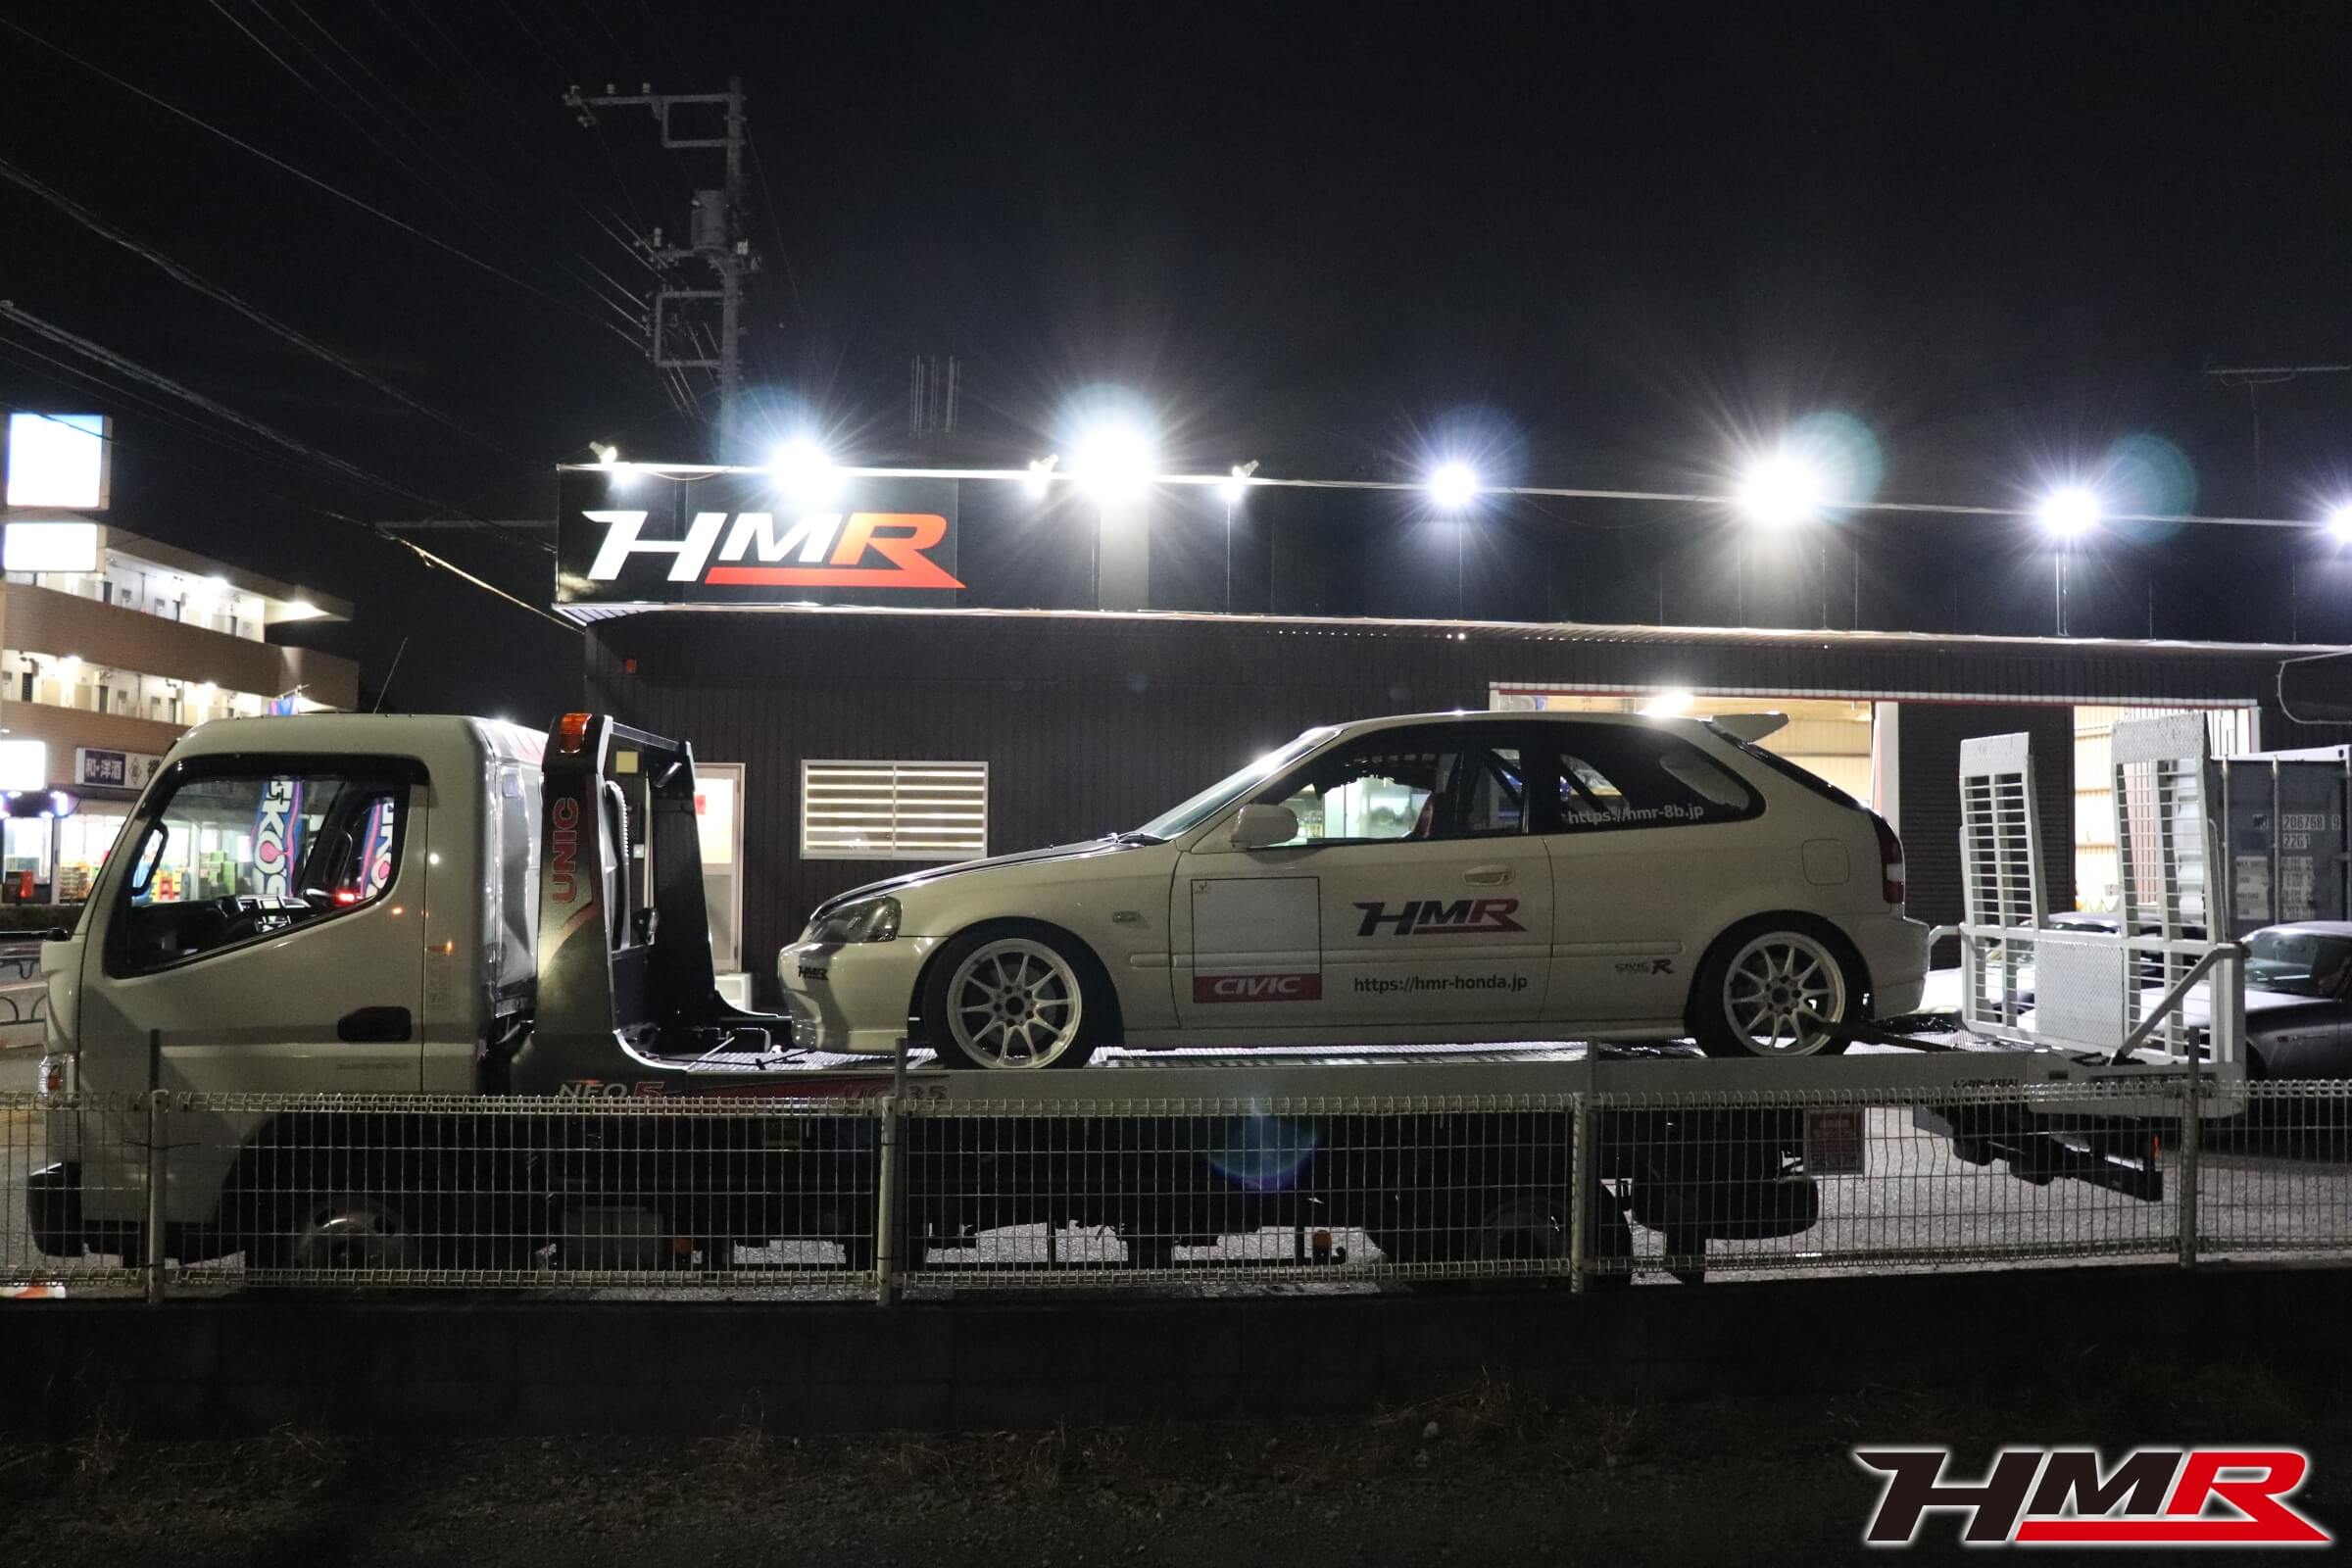 Fuji1-GP EK9レース車両積み込み